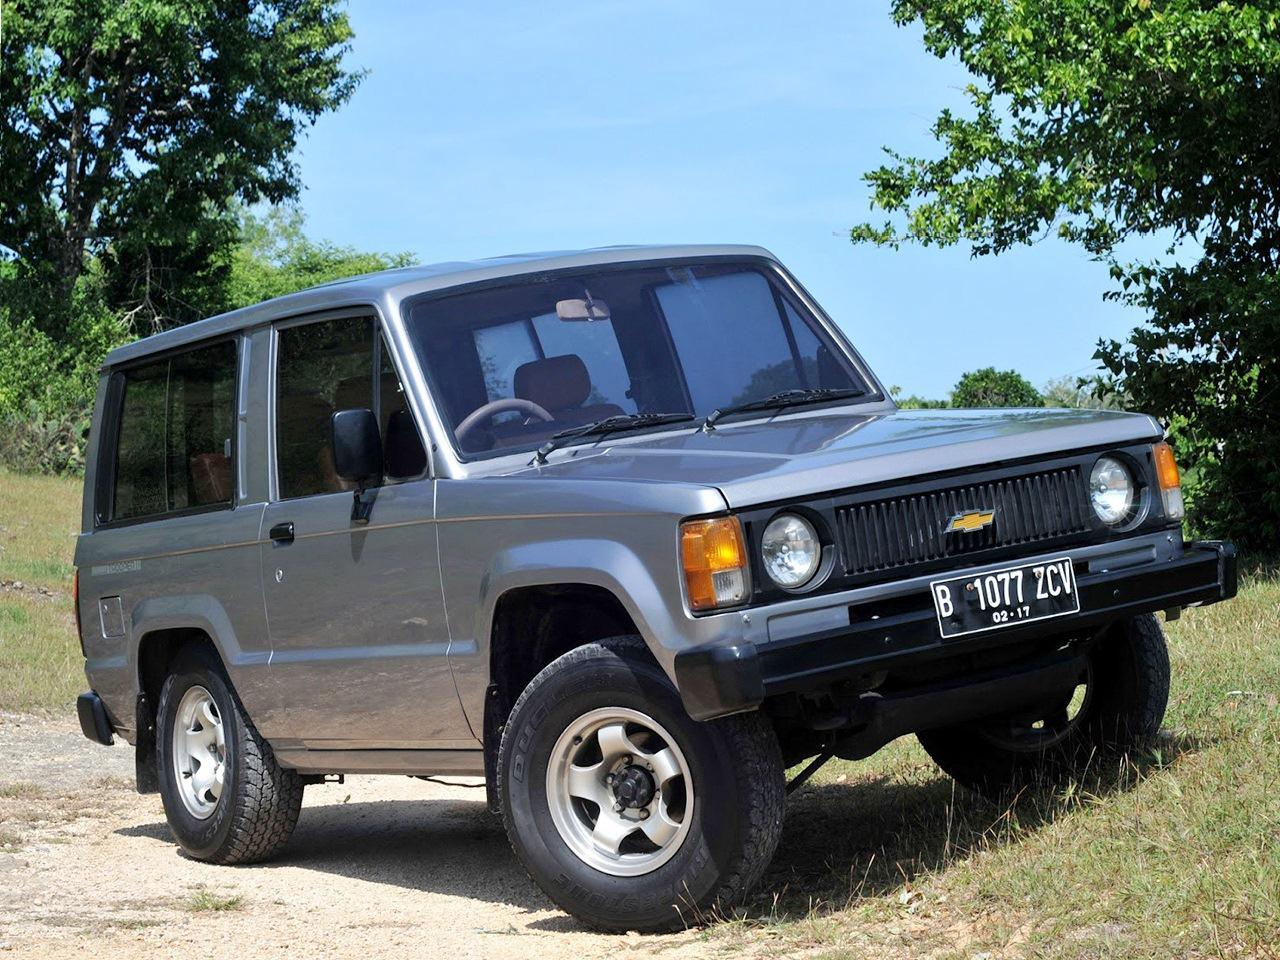 Isuzu Trooper I 1981 - 1991 SUV #2